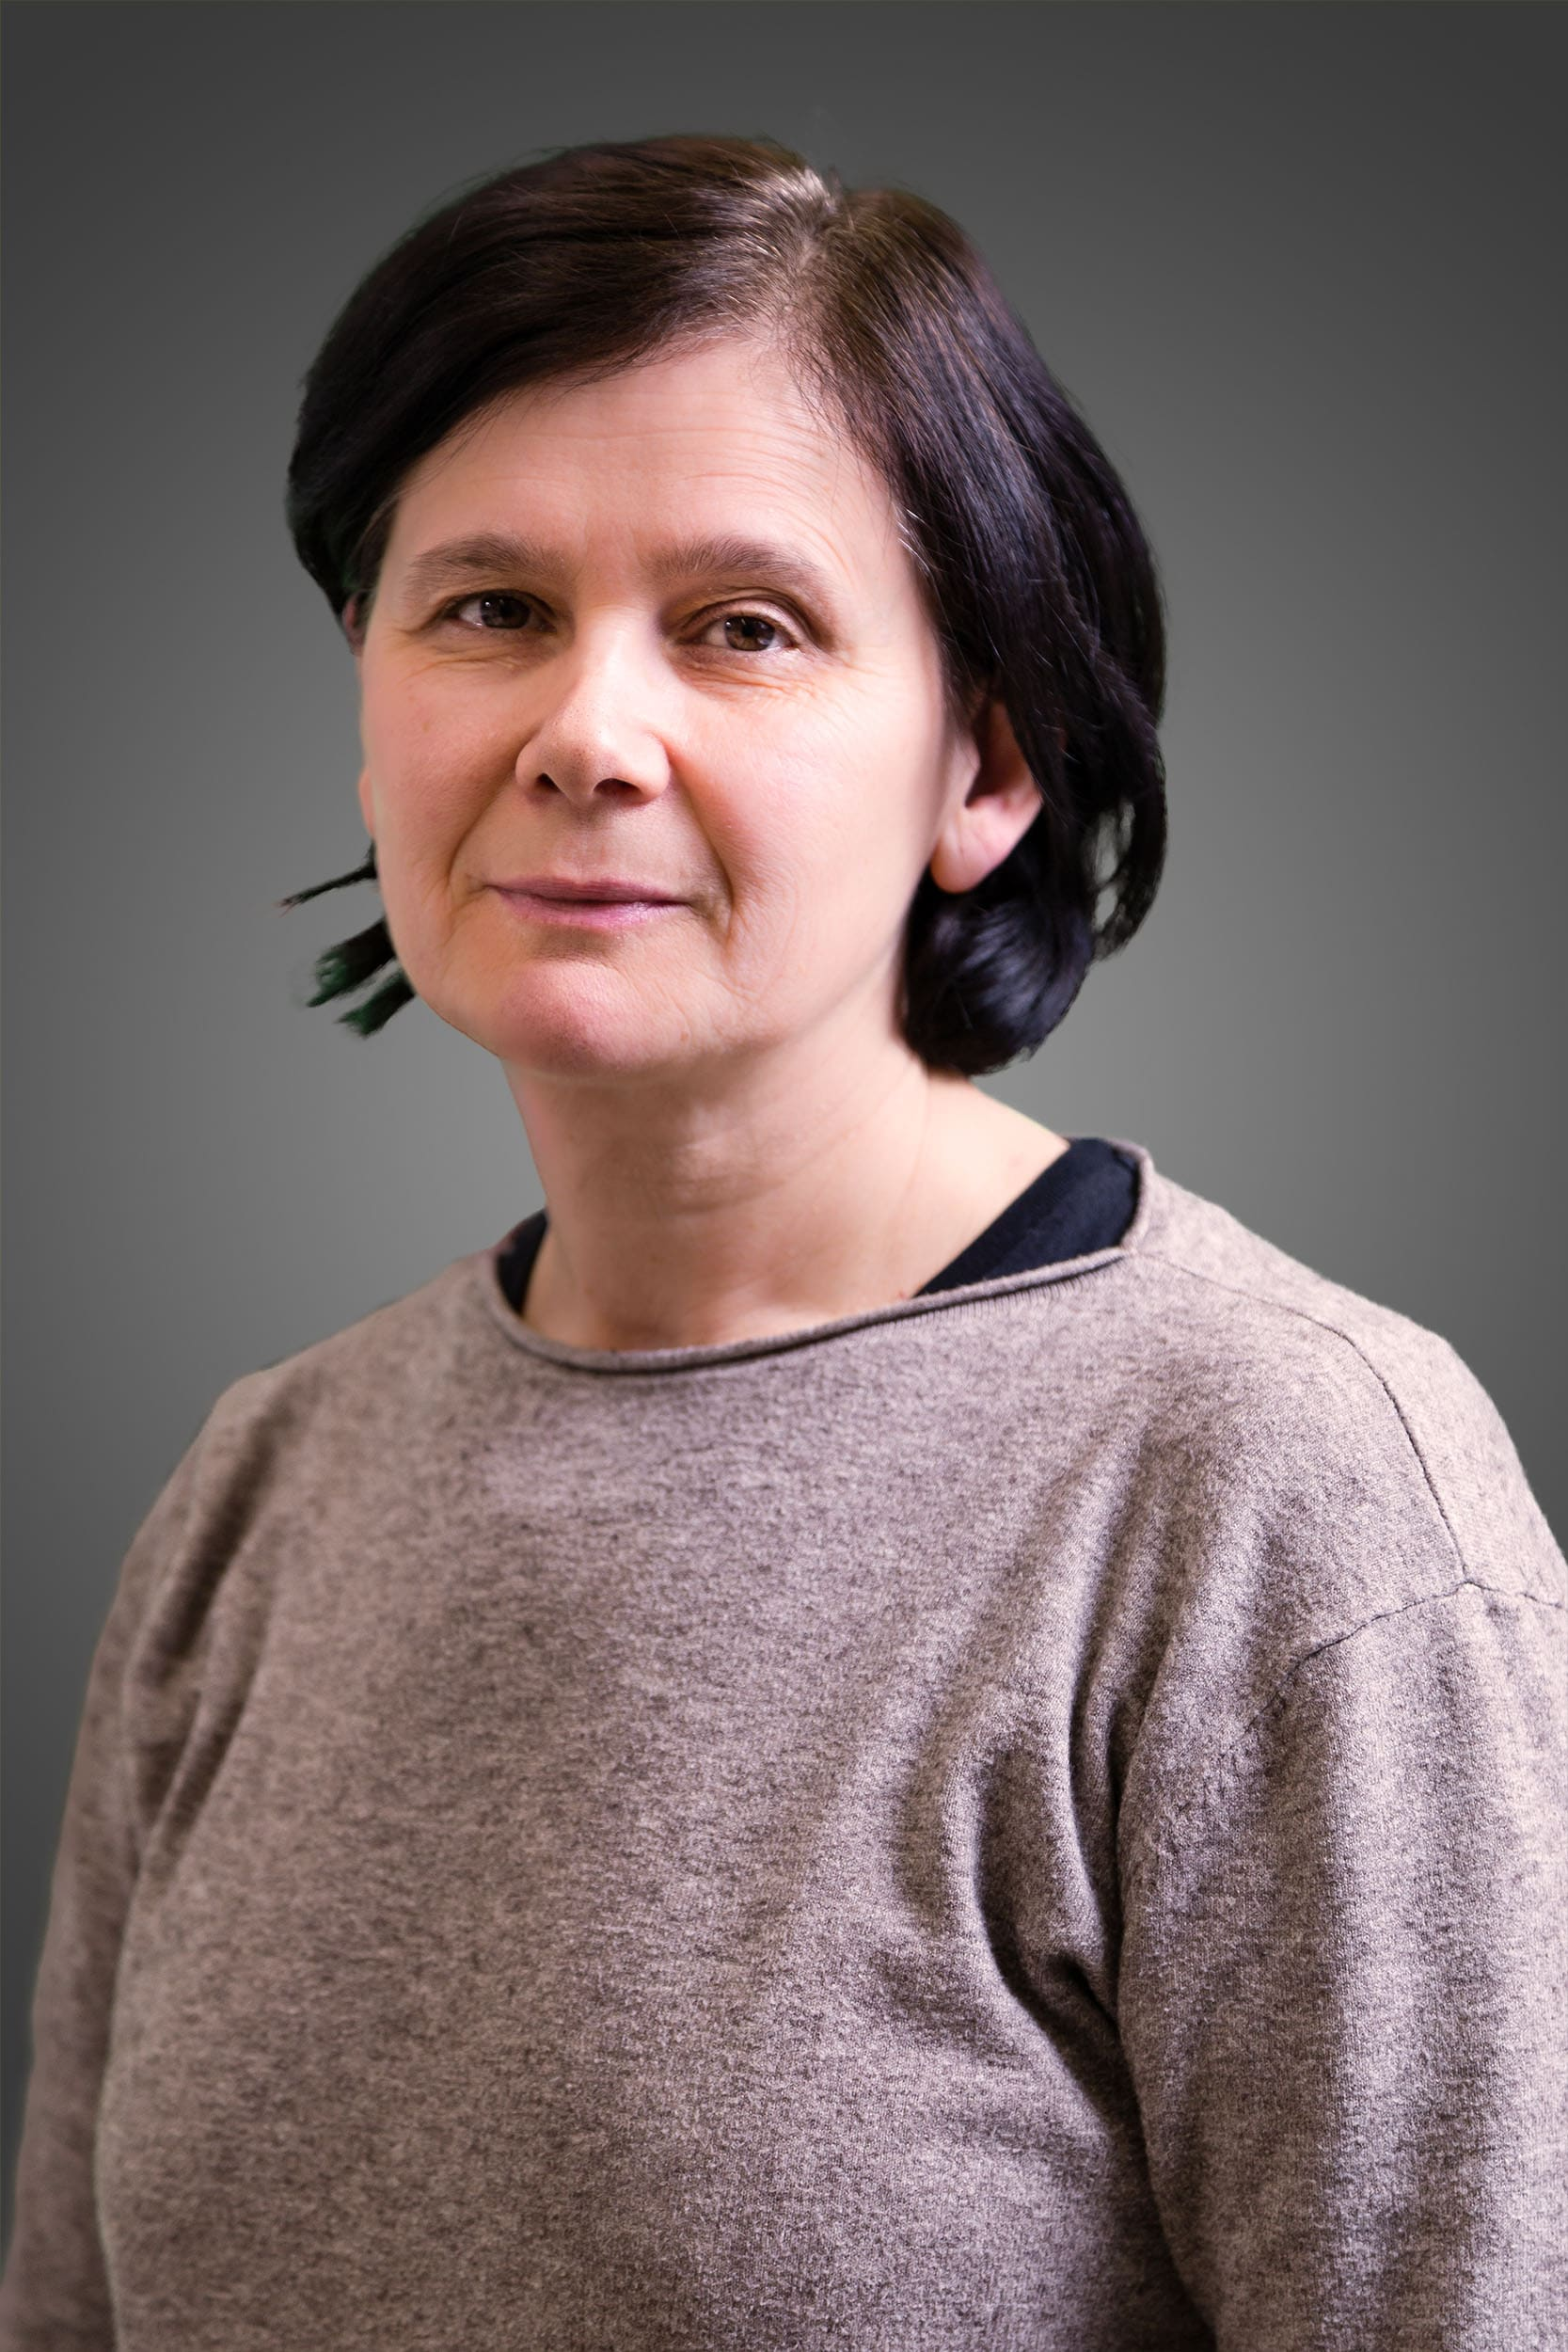 Loredana Scorcelletti